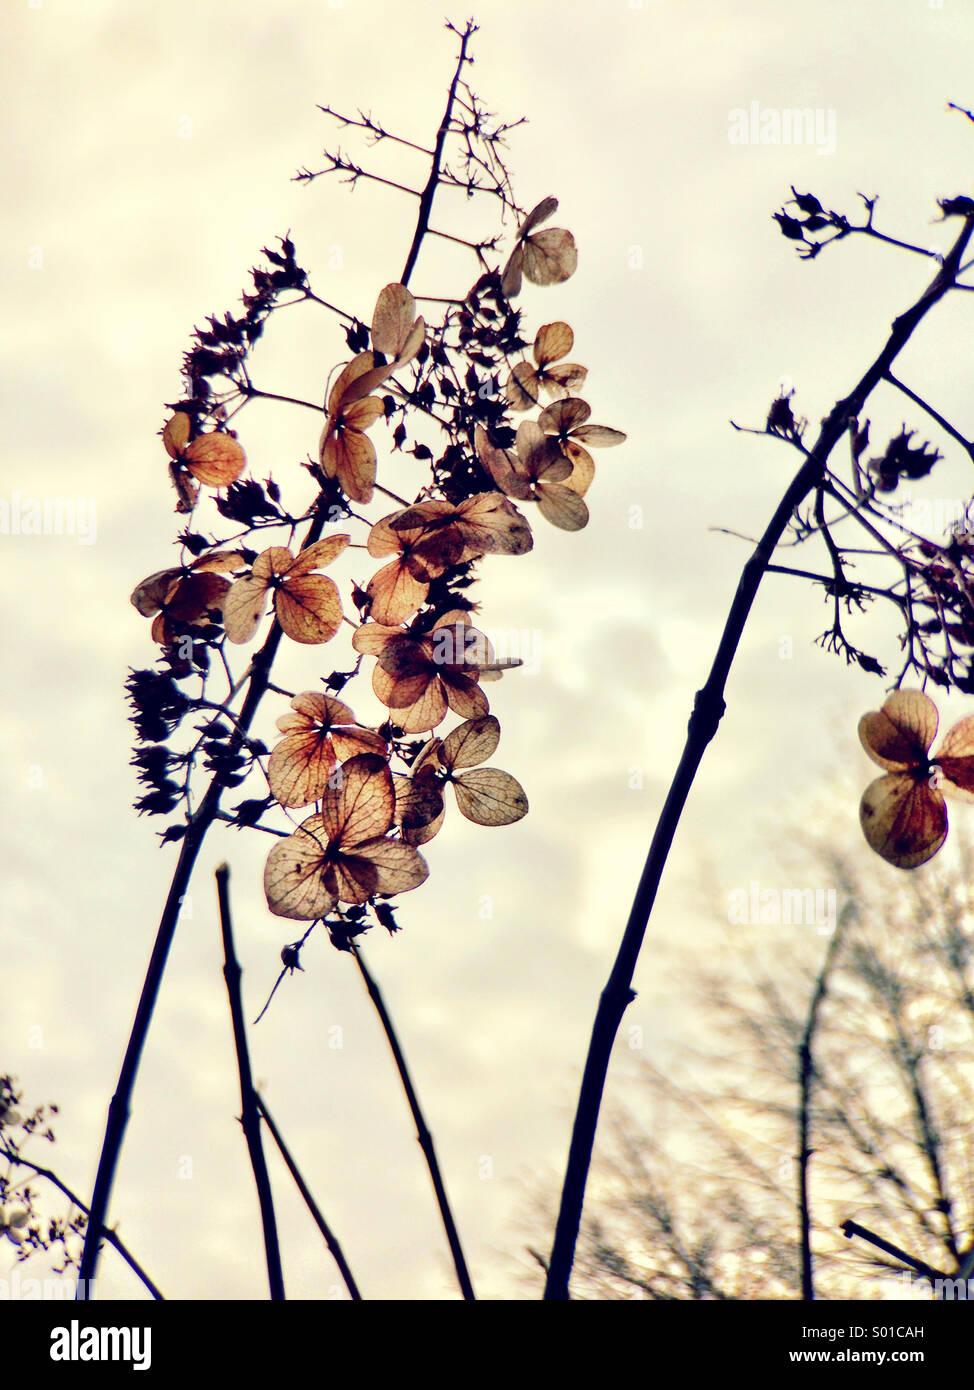 Trockene Blumen im Winter. Stockbild